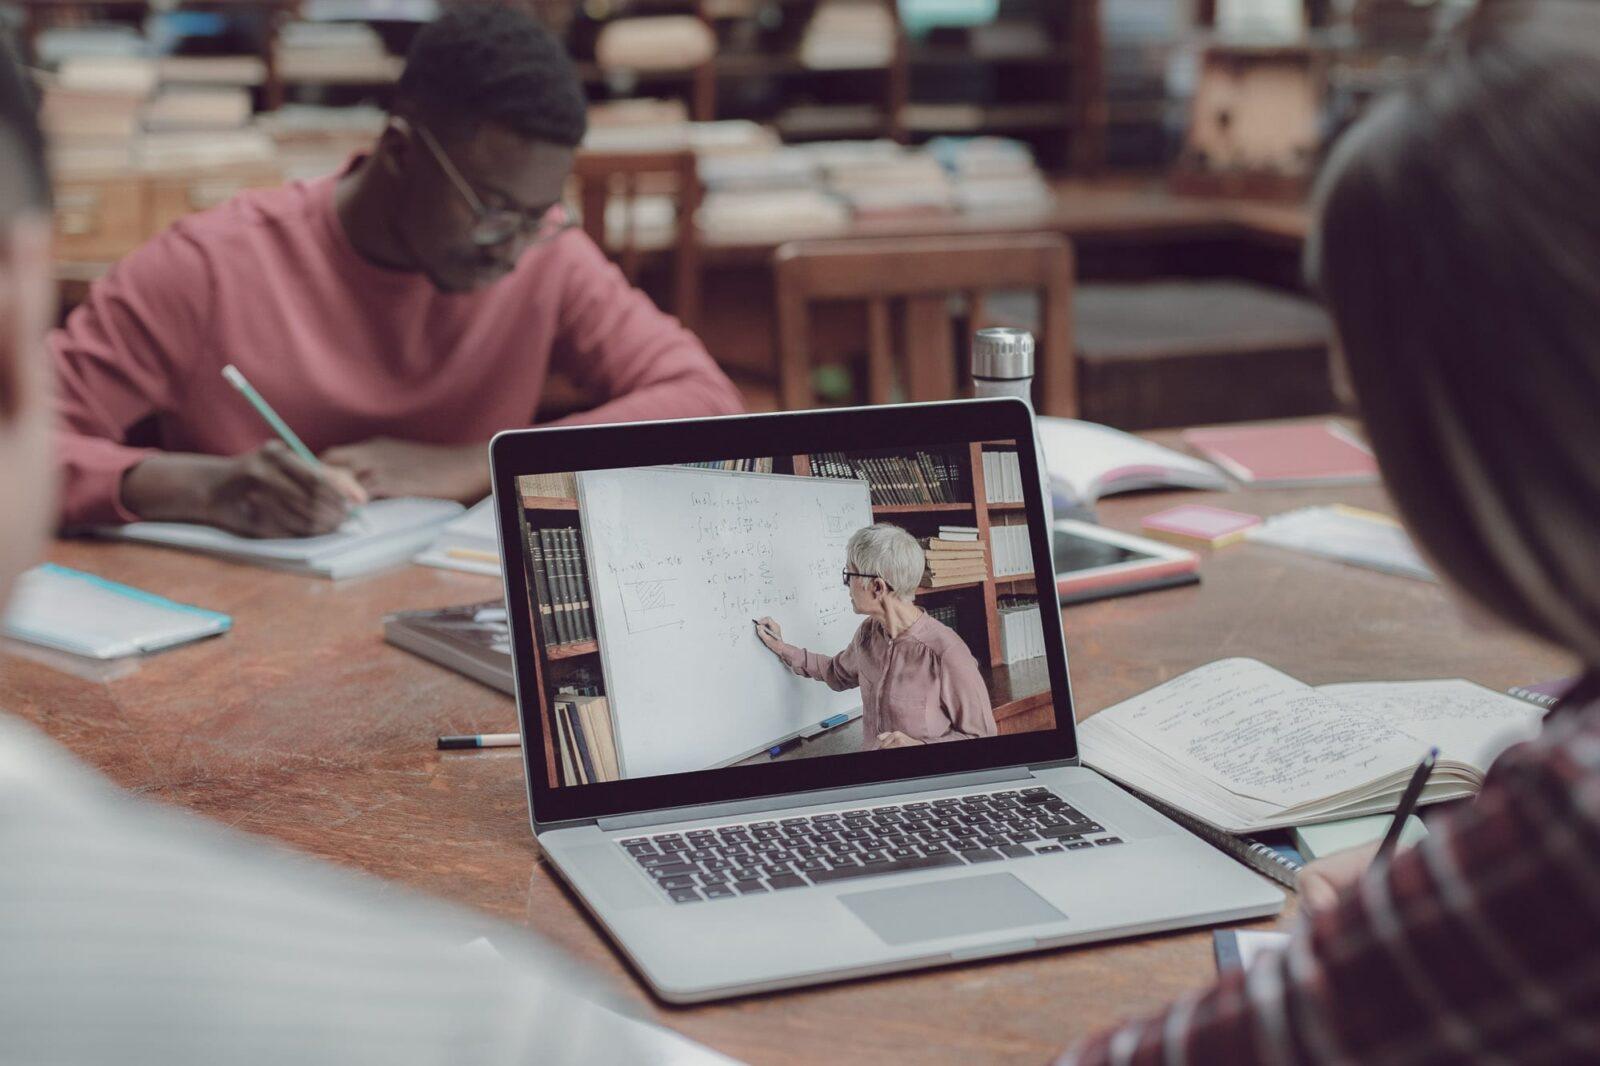 Watching teacher on laptop